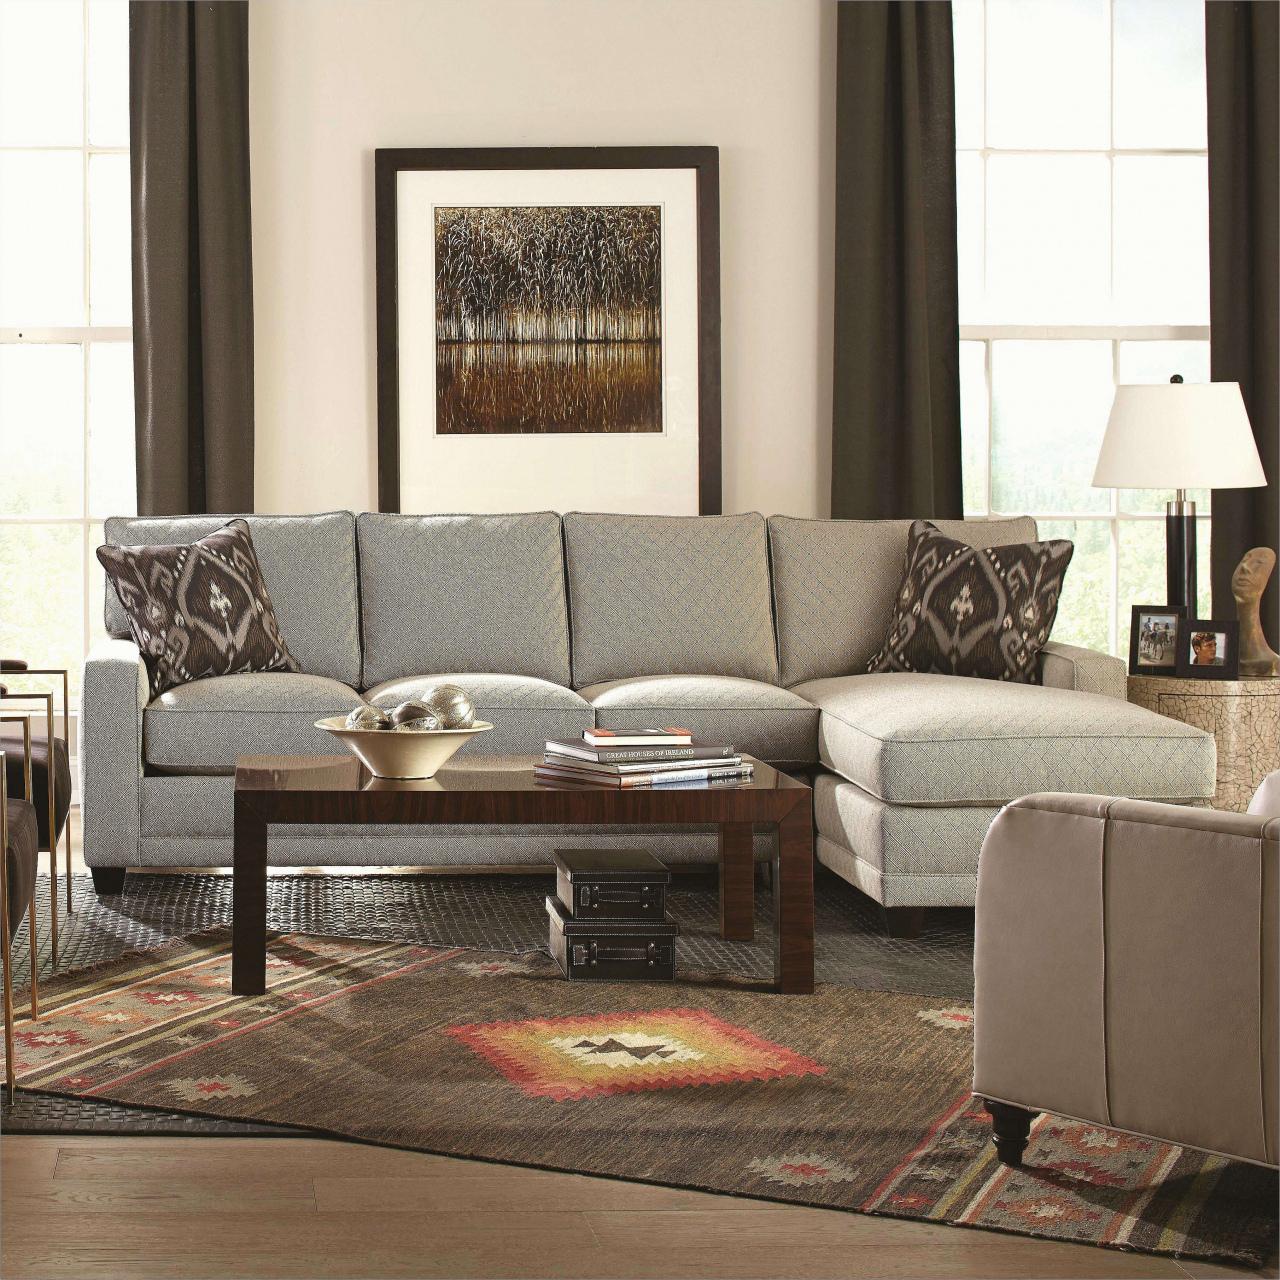 Macys Living Room Furniture